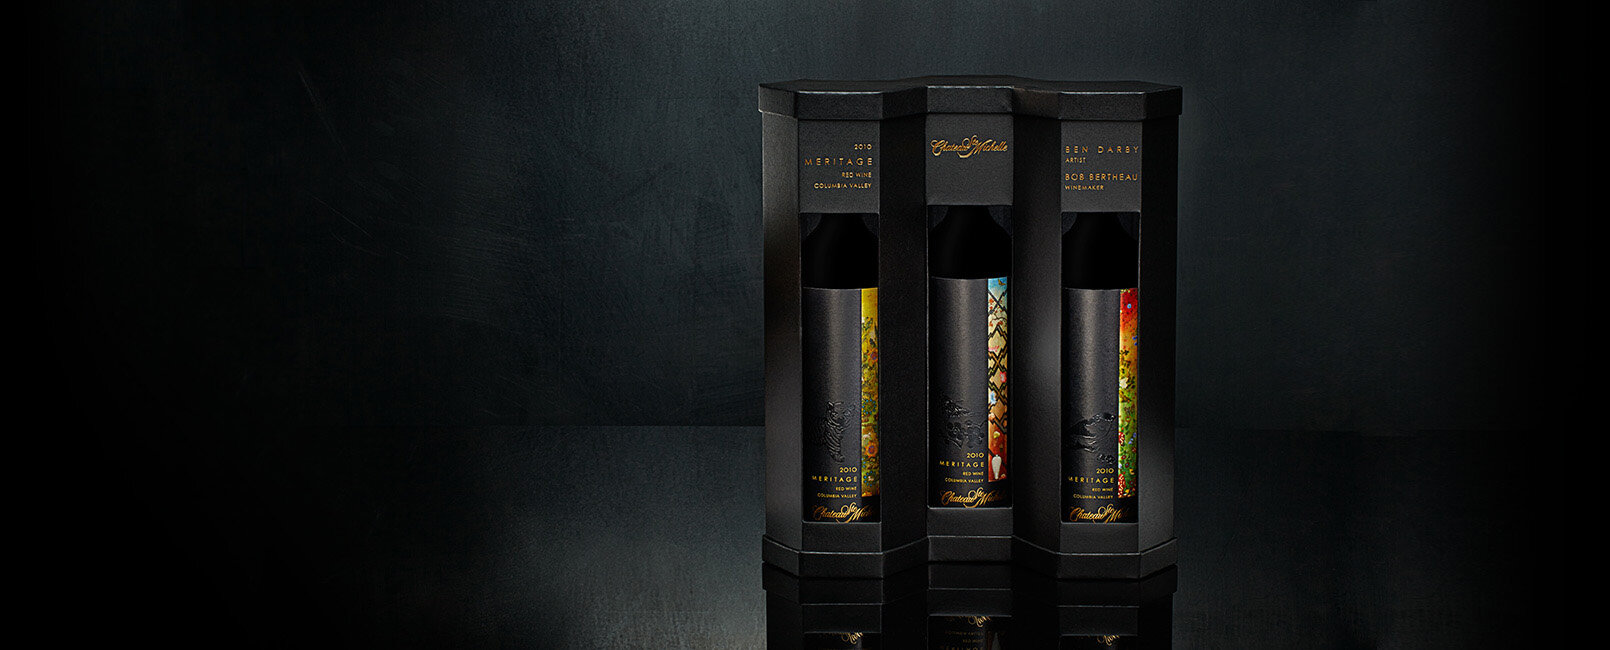 Chateau-Ste-Michelle-Wine-Case-Design-Packaging-Company-Header.jpg